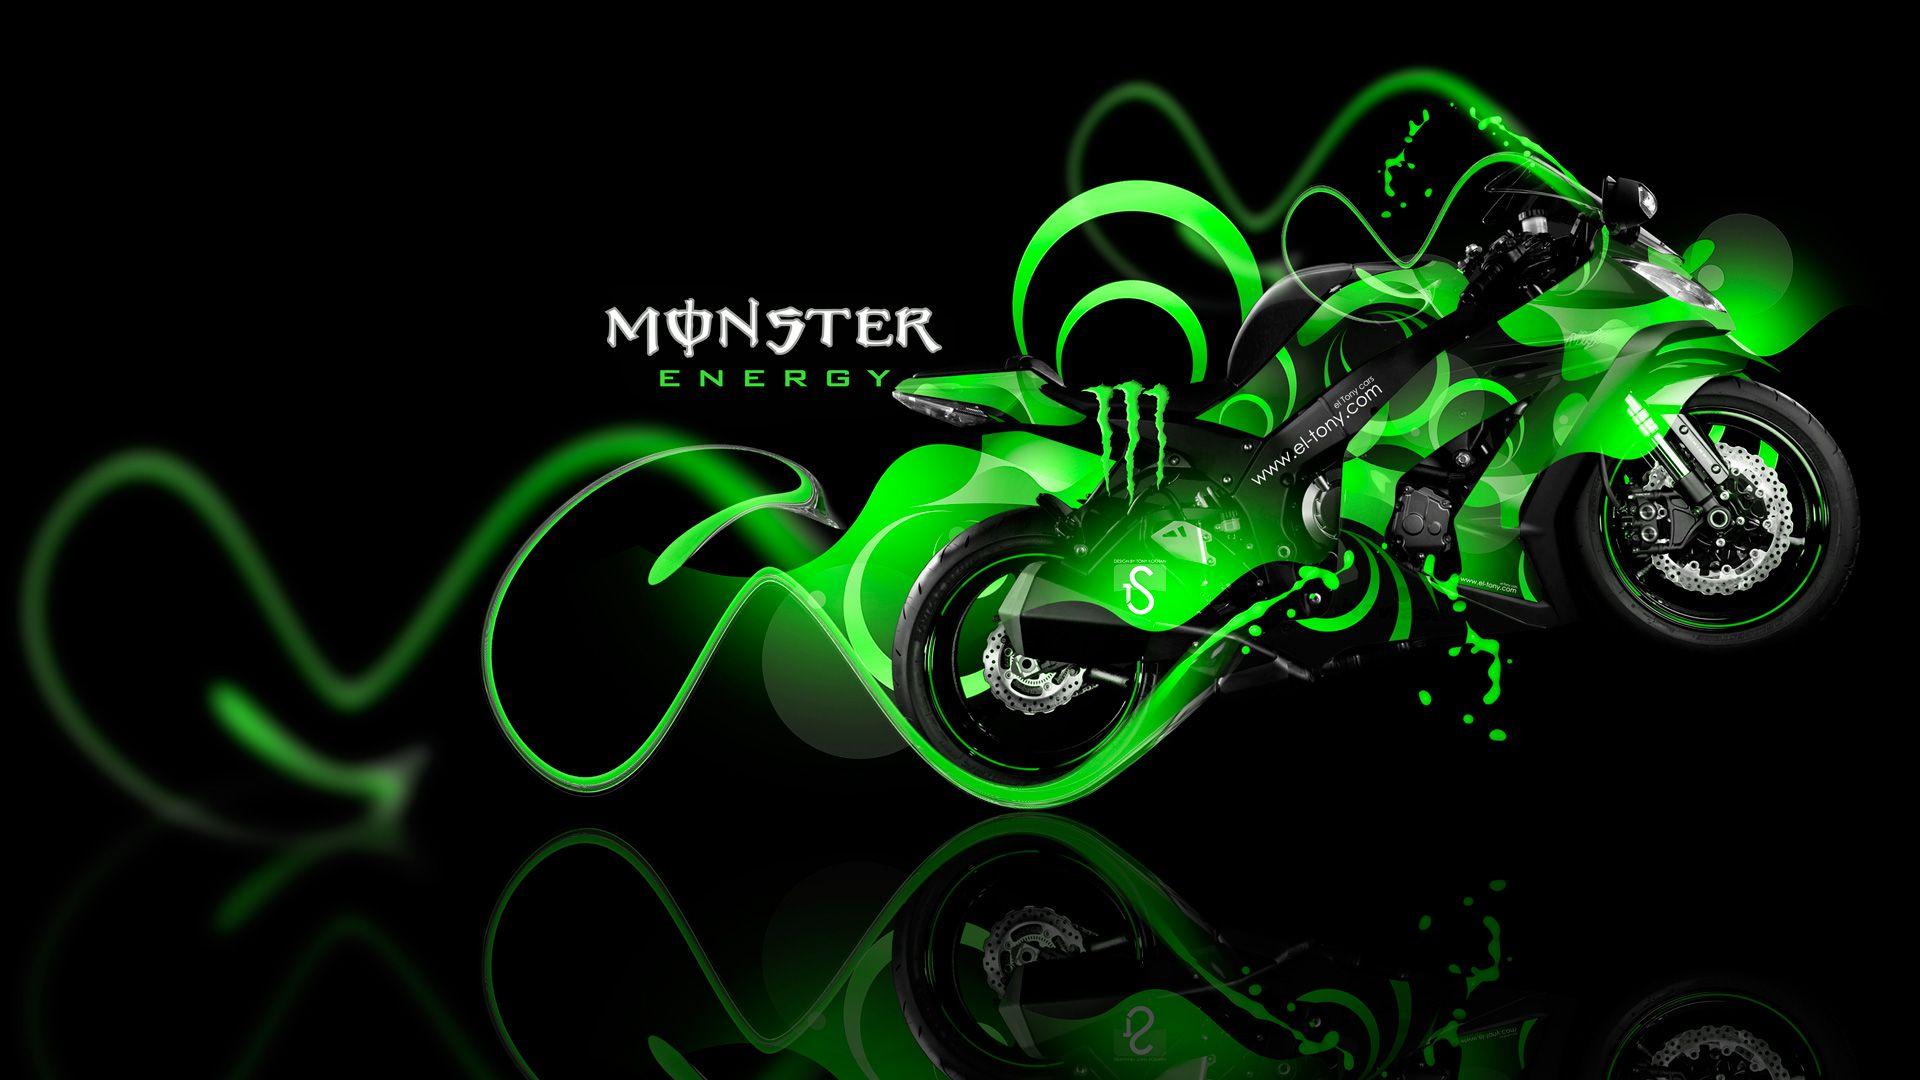 Monster Energy Kawasaki Ninja Green Plastic Bike 2014 Design